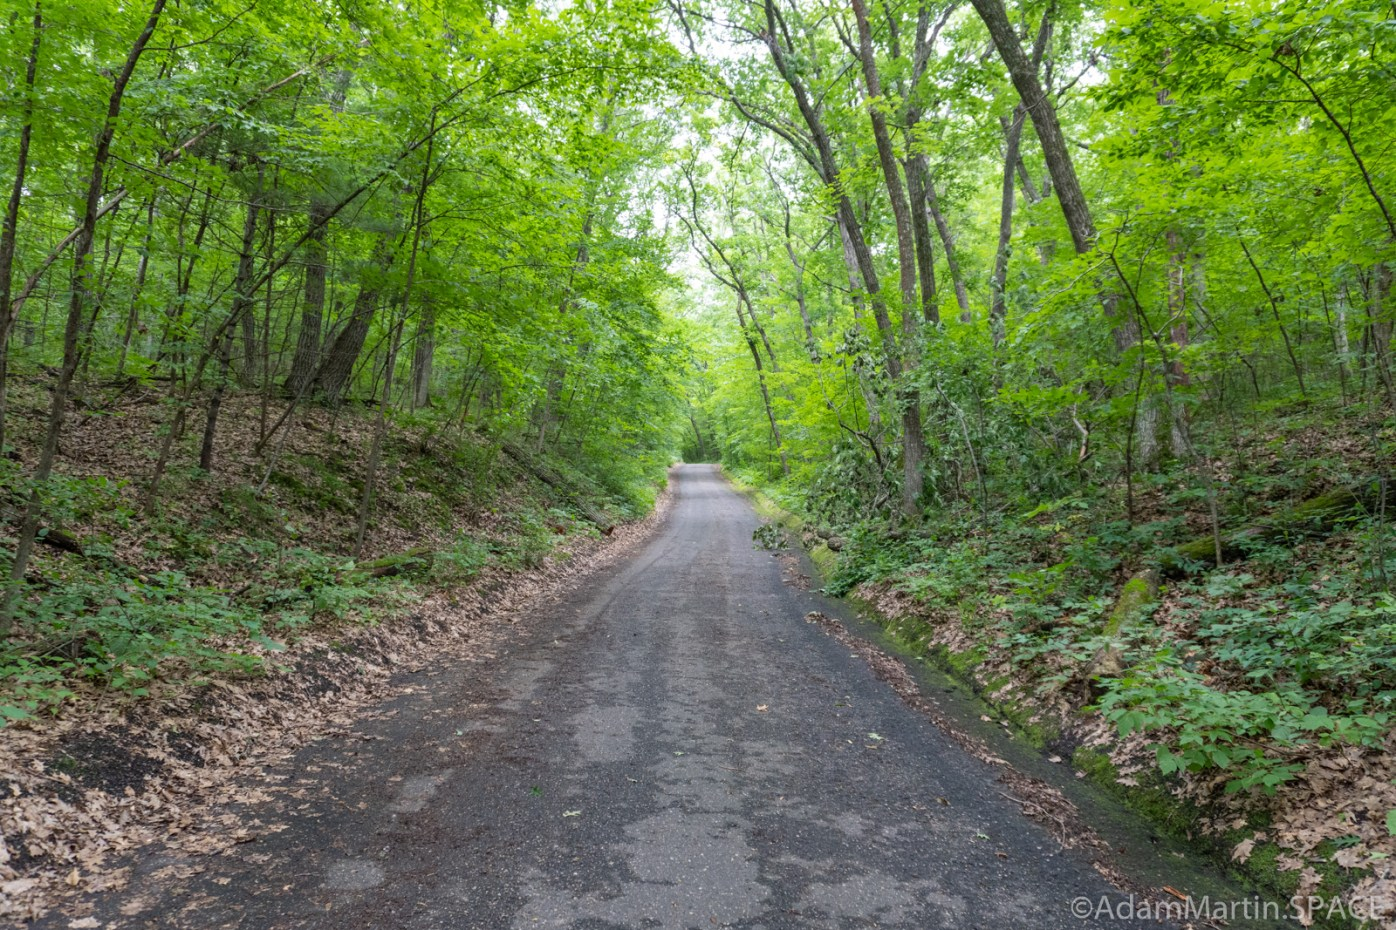 Kinnikinnic State Park – Hiking back up the steep Black Trail